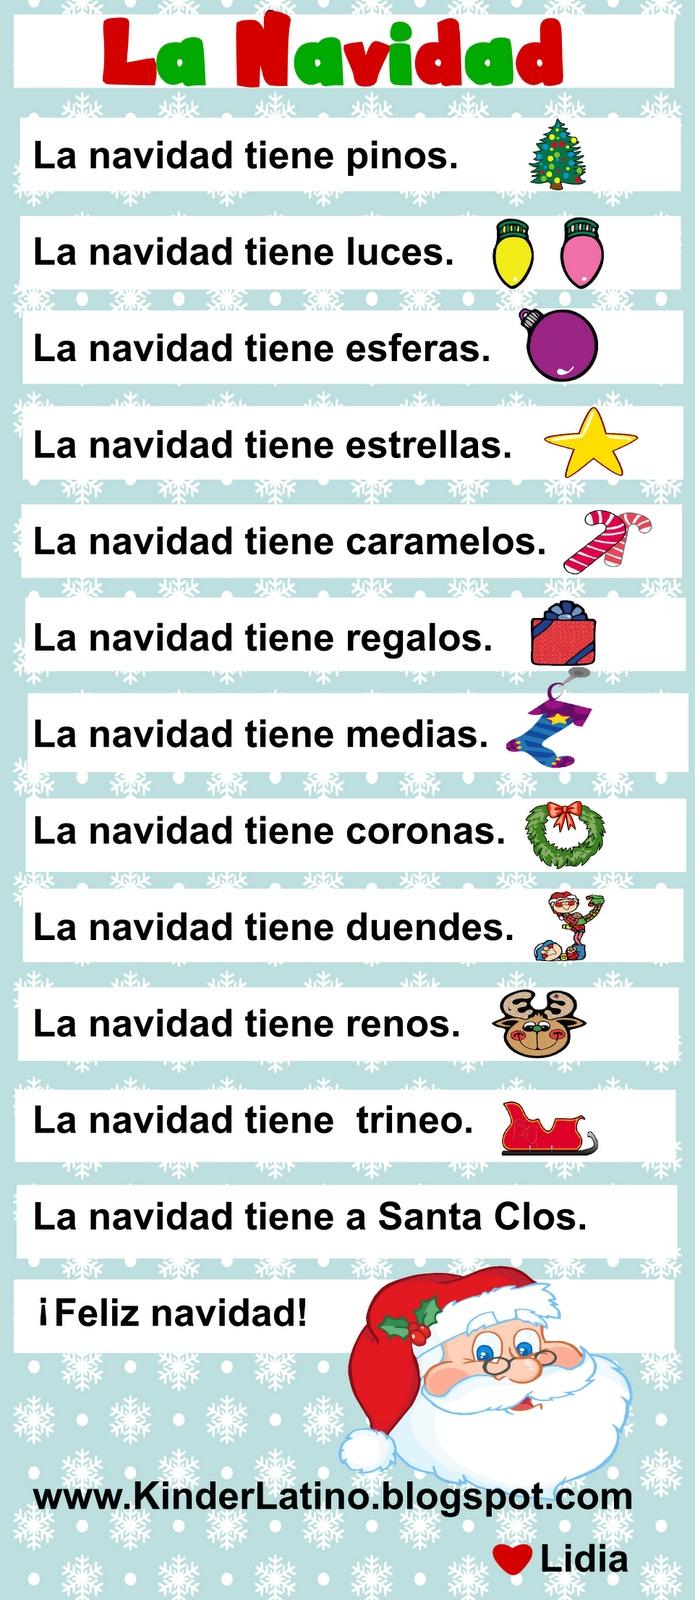 Kinder Latino: Bilingual Teaching Resources